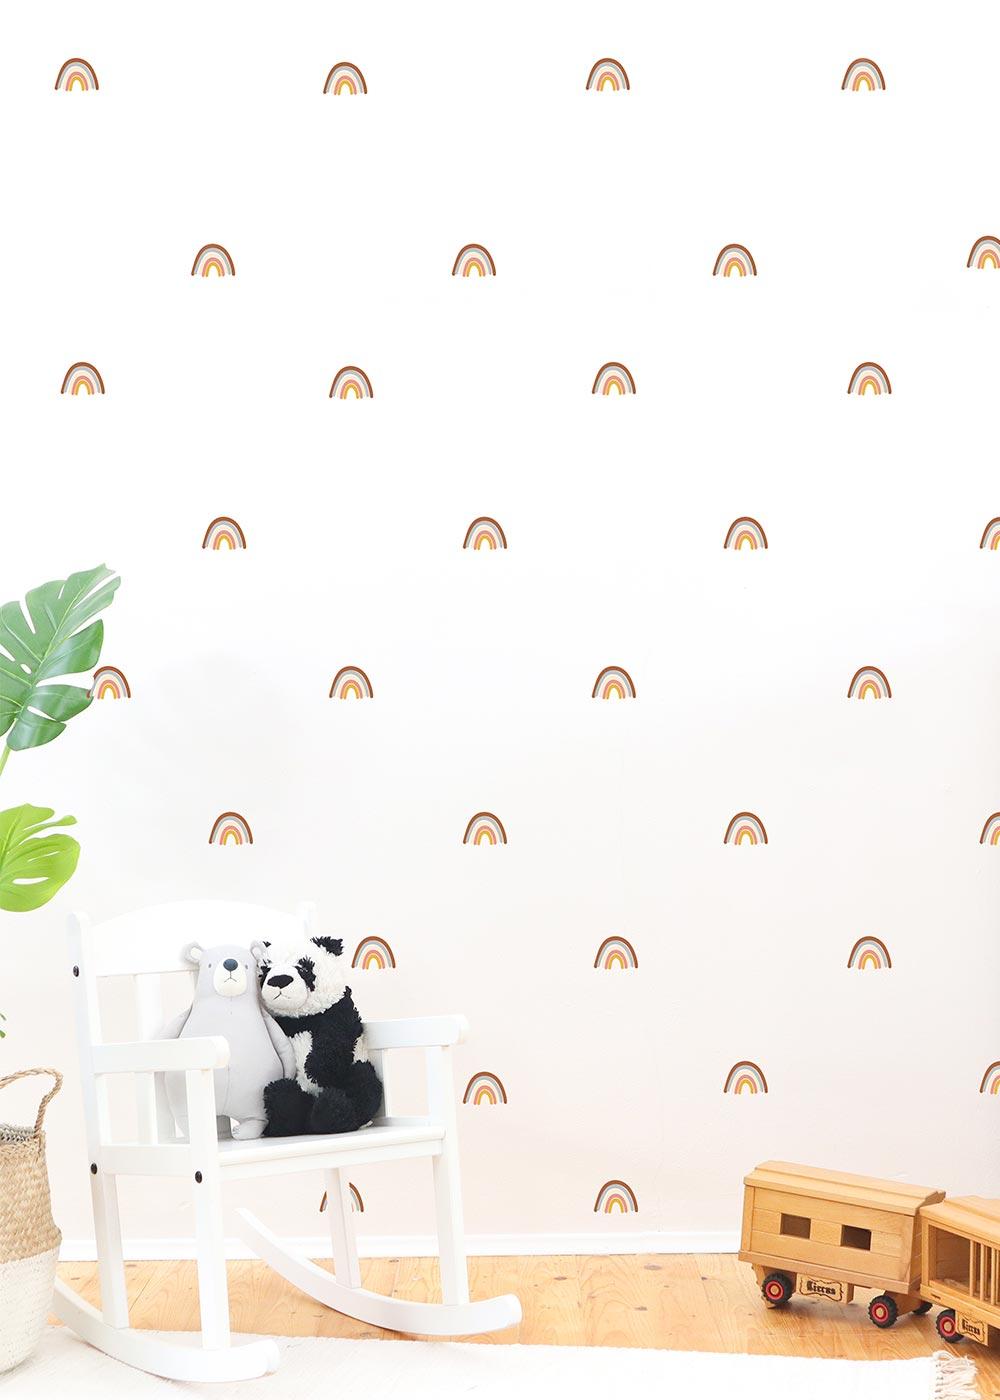 Wandtattoo Regenbögen Wandgestaltung im Kinderzimmer Camel